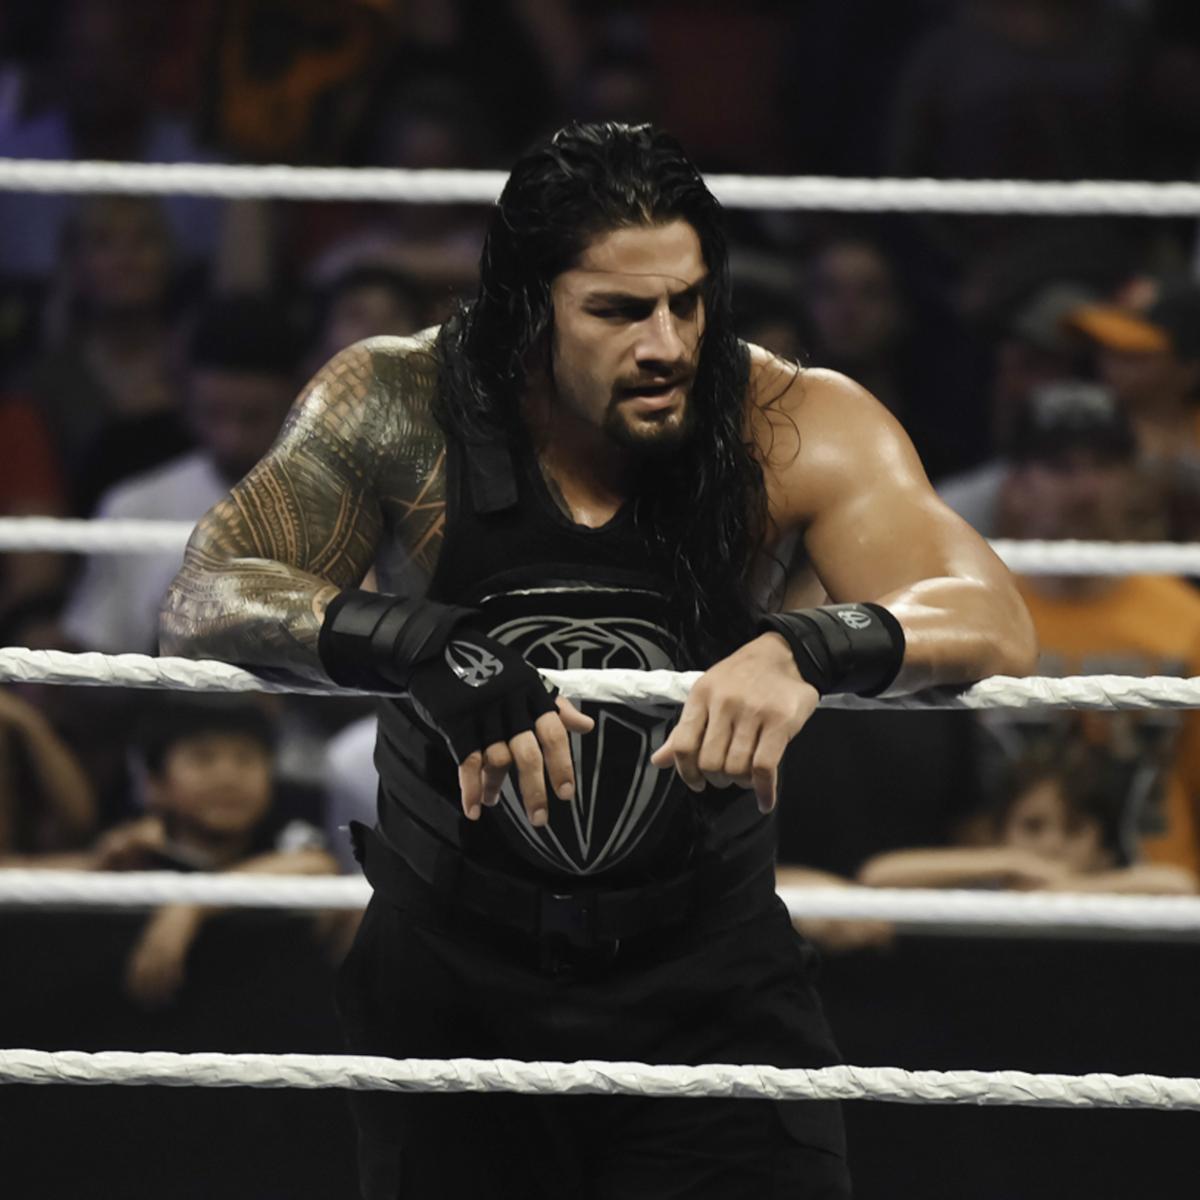 2017 Latest News: Roman Reigns Vs. Braun Strowman Announced For WWE Fastlane